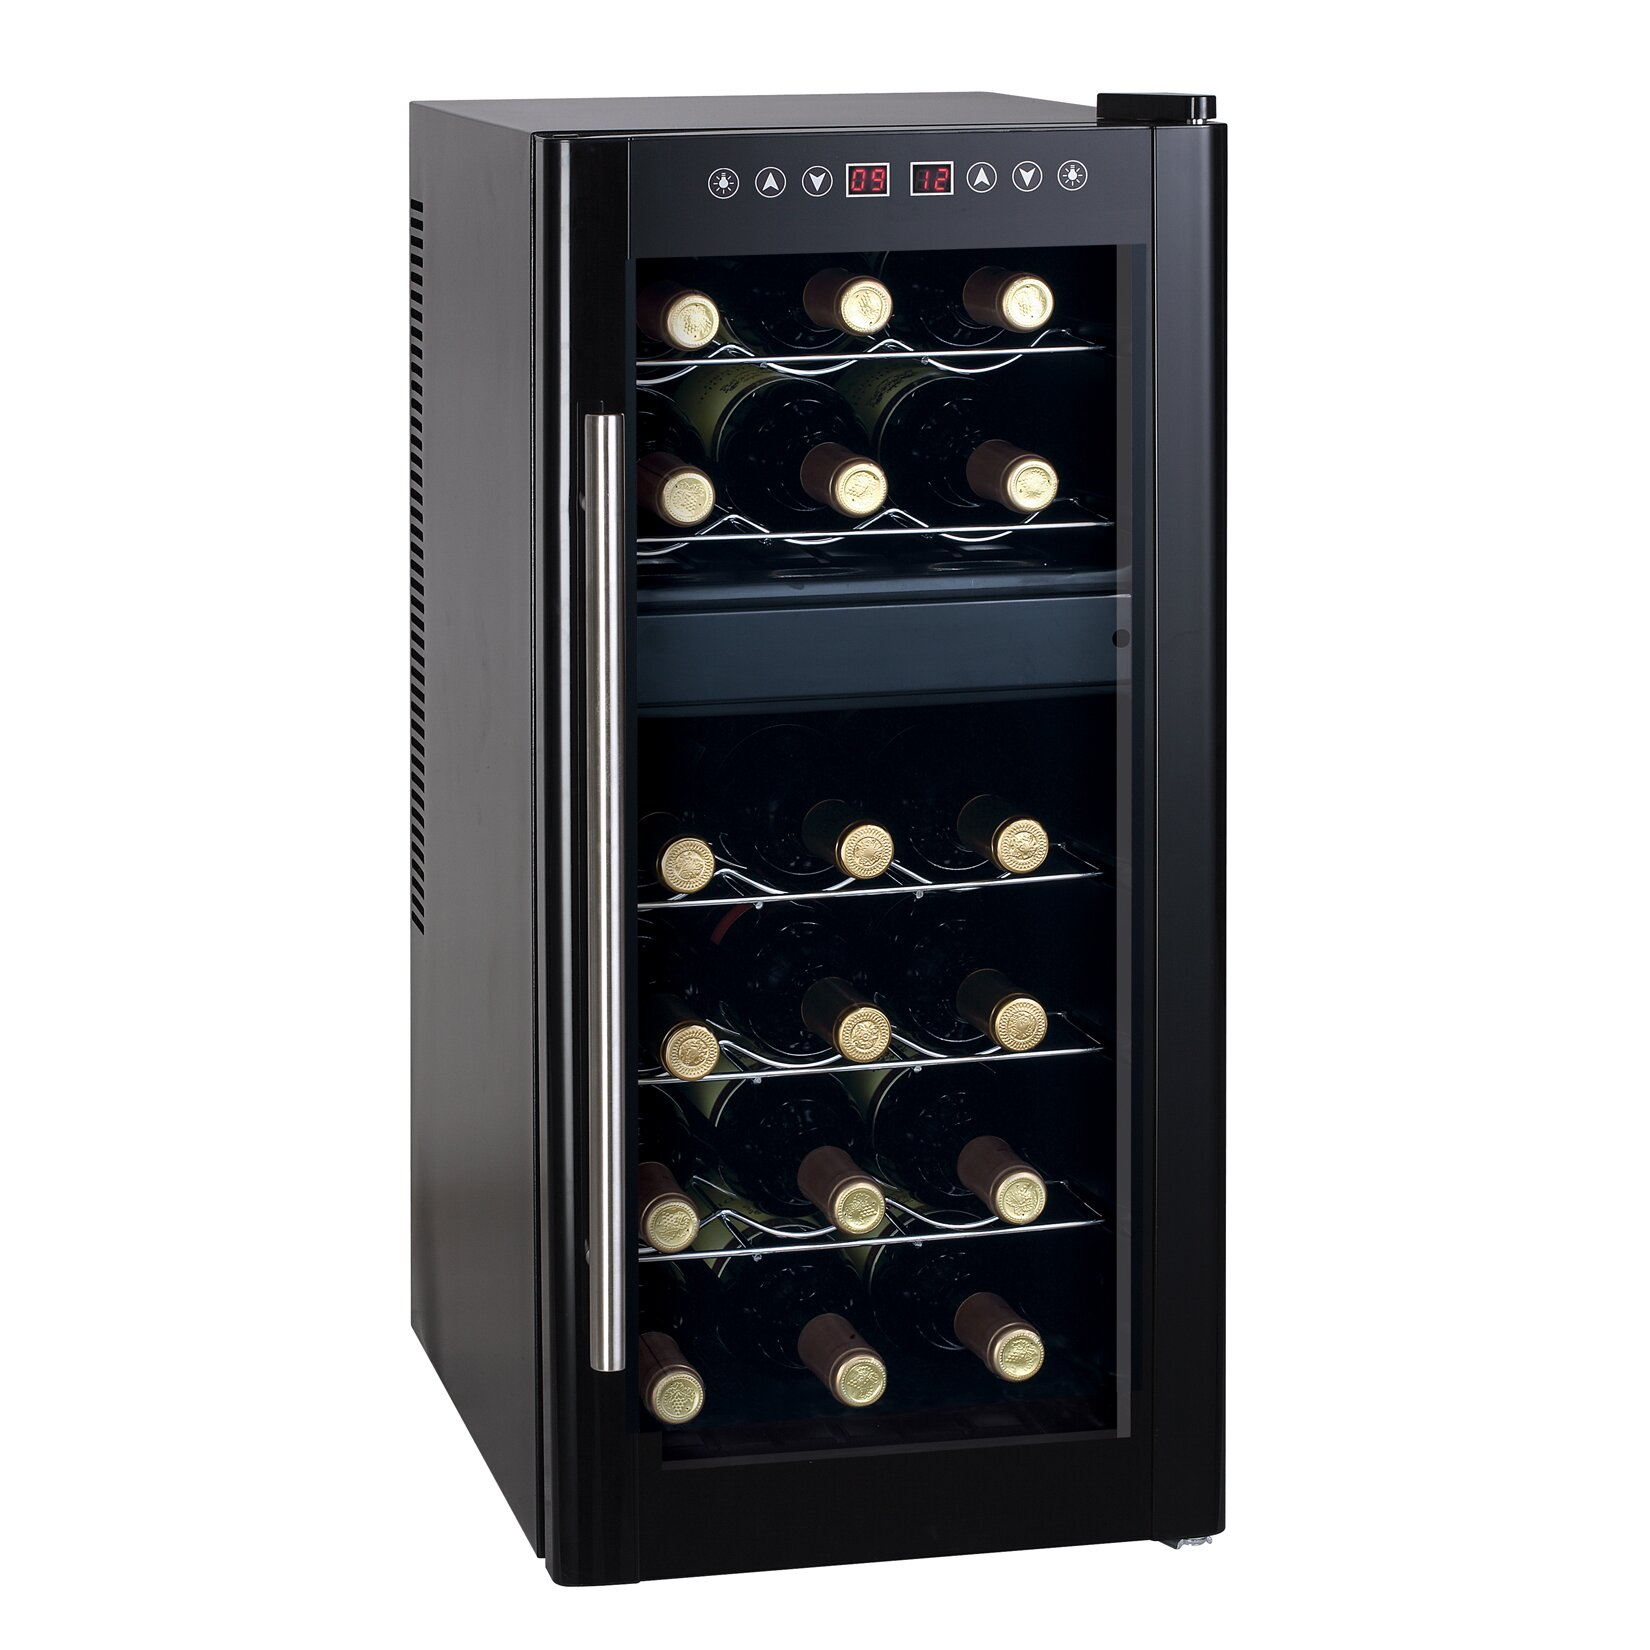 sunpentown 18 bottle dual zone freestanding wine refrigerator reviews wayfair. Black Bedroom Furniture Sets. Home Design Ideas